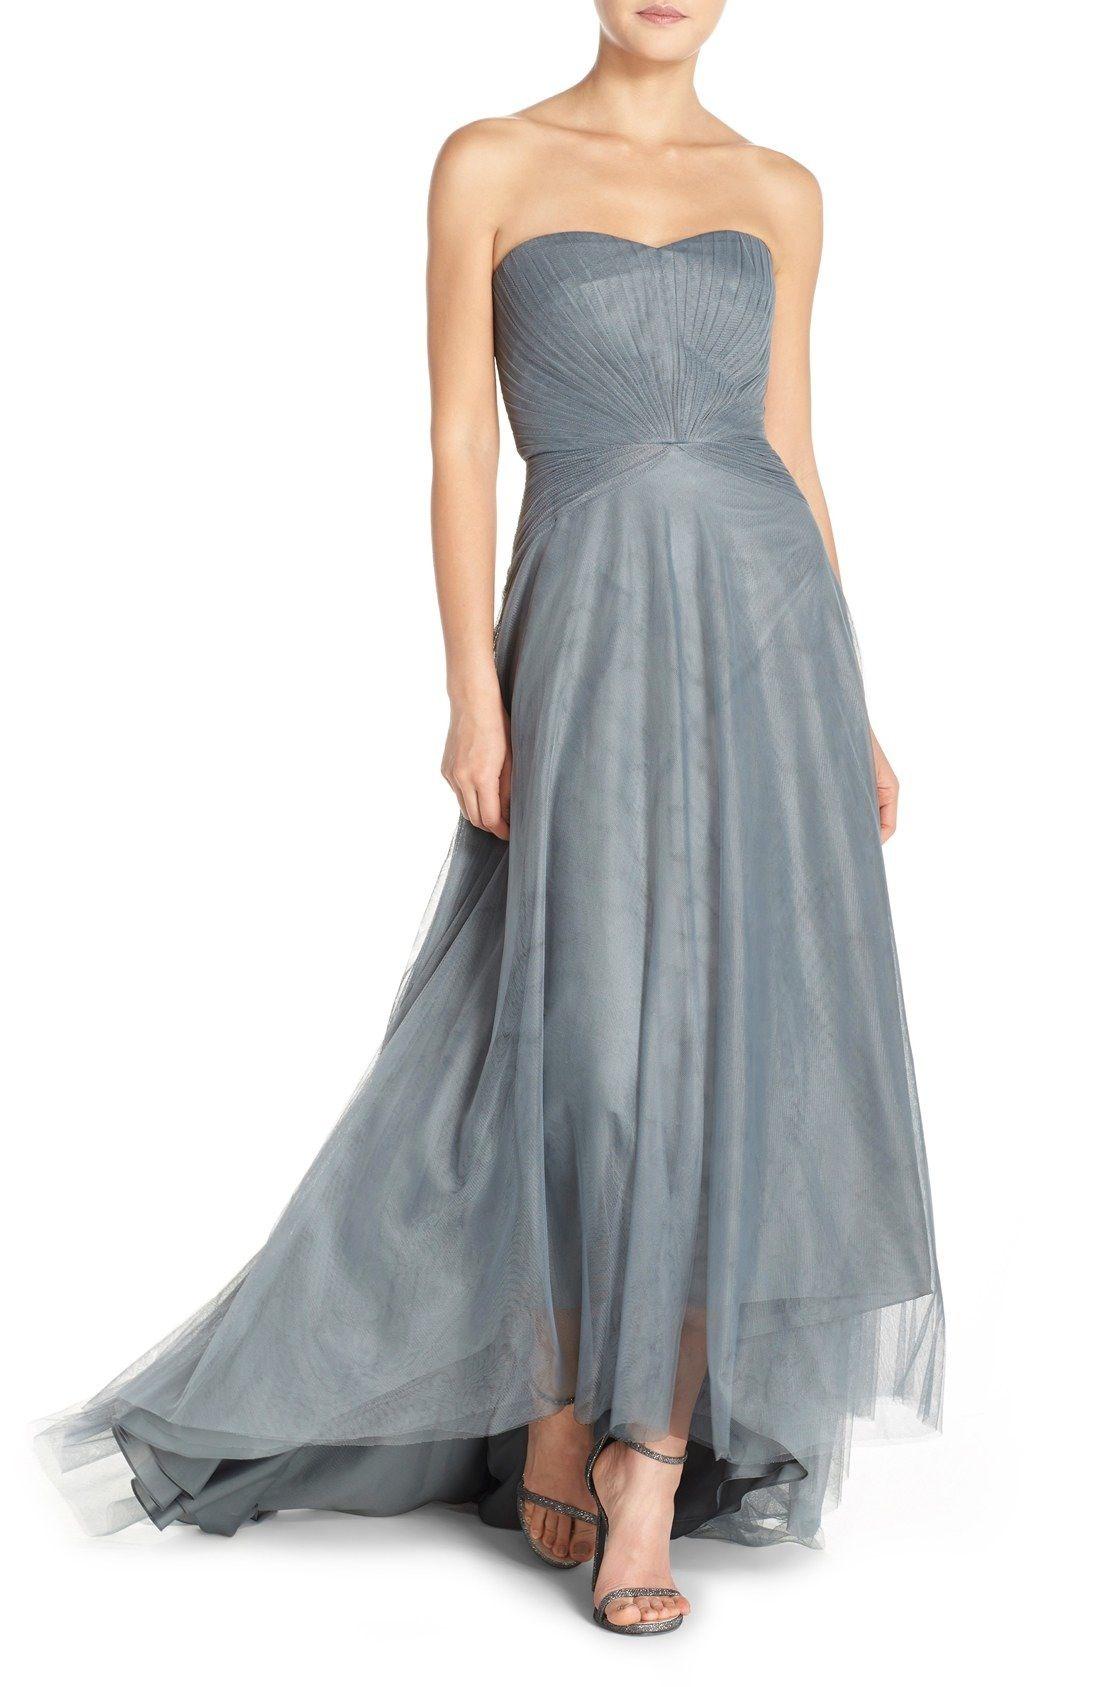 Monique Lhuillier Bridesmaids Pleat Tulle Strapless Gown available ...